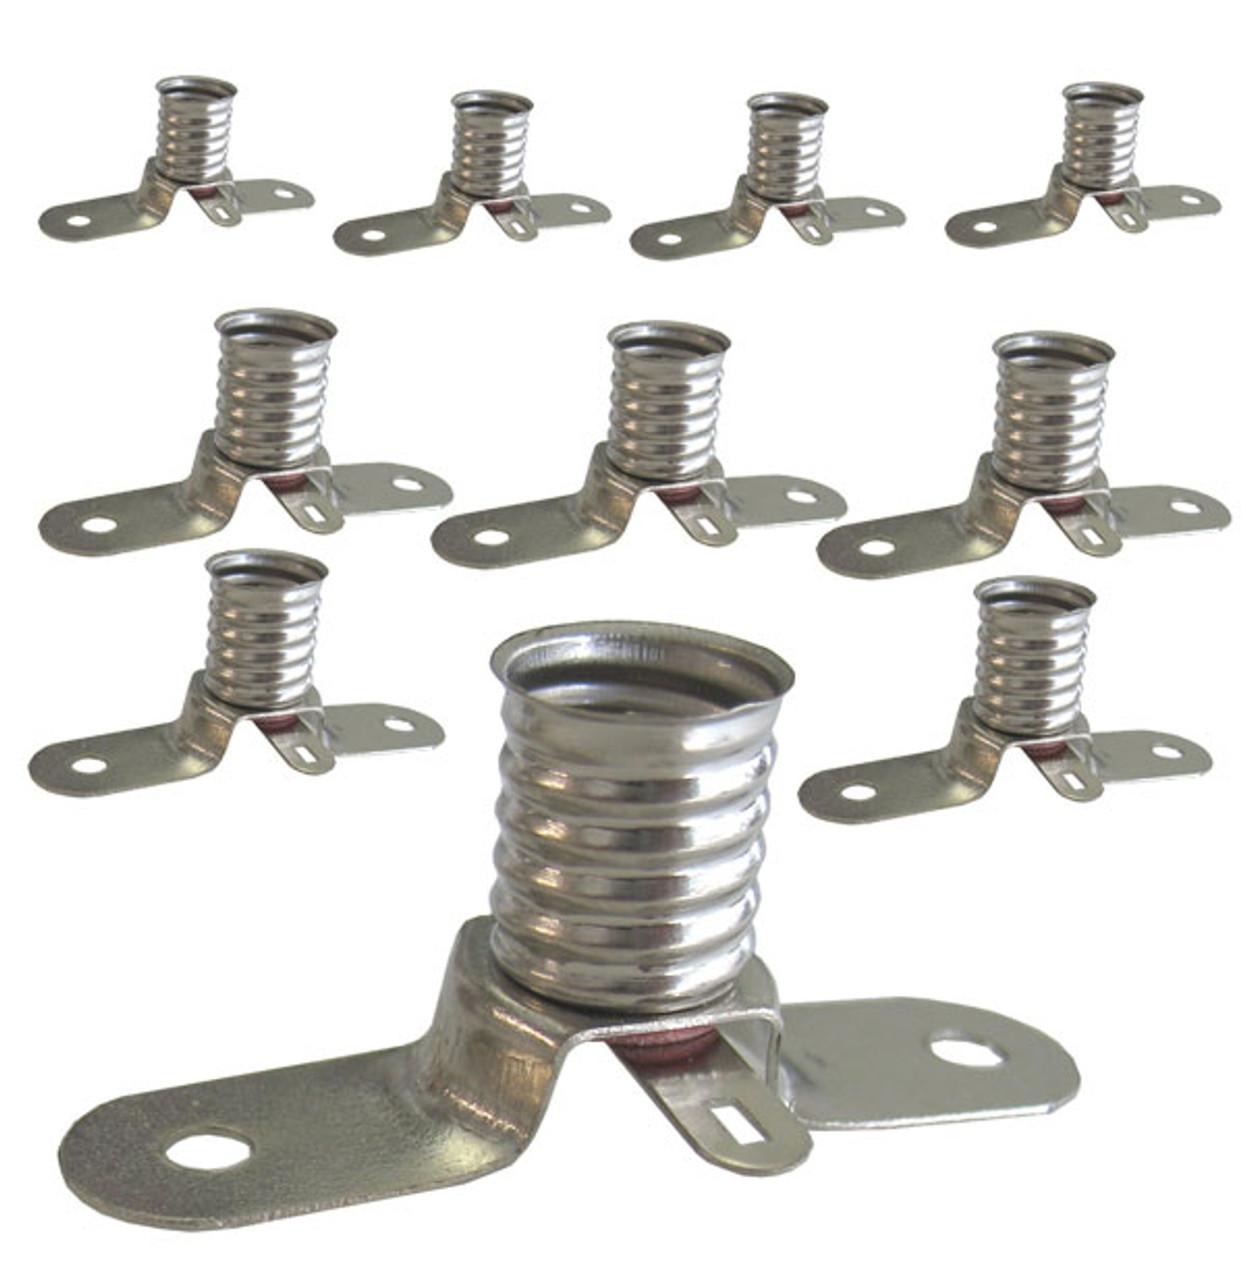 Set of 10 lamp holders